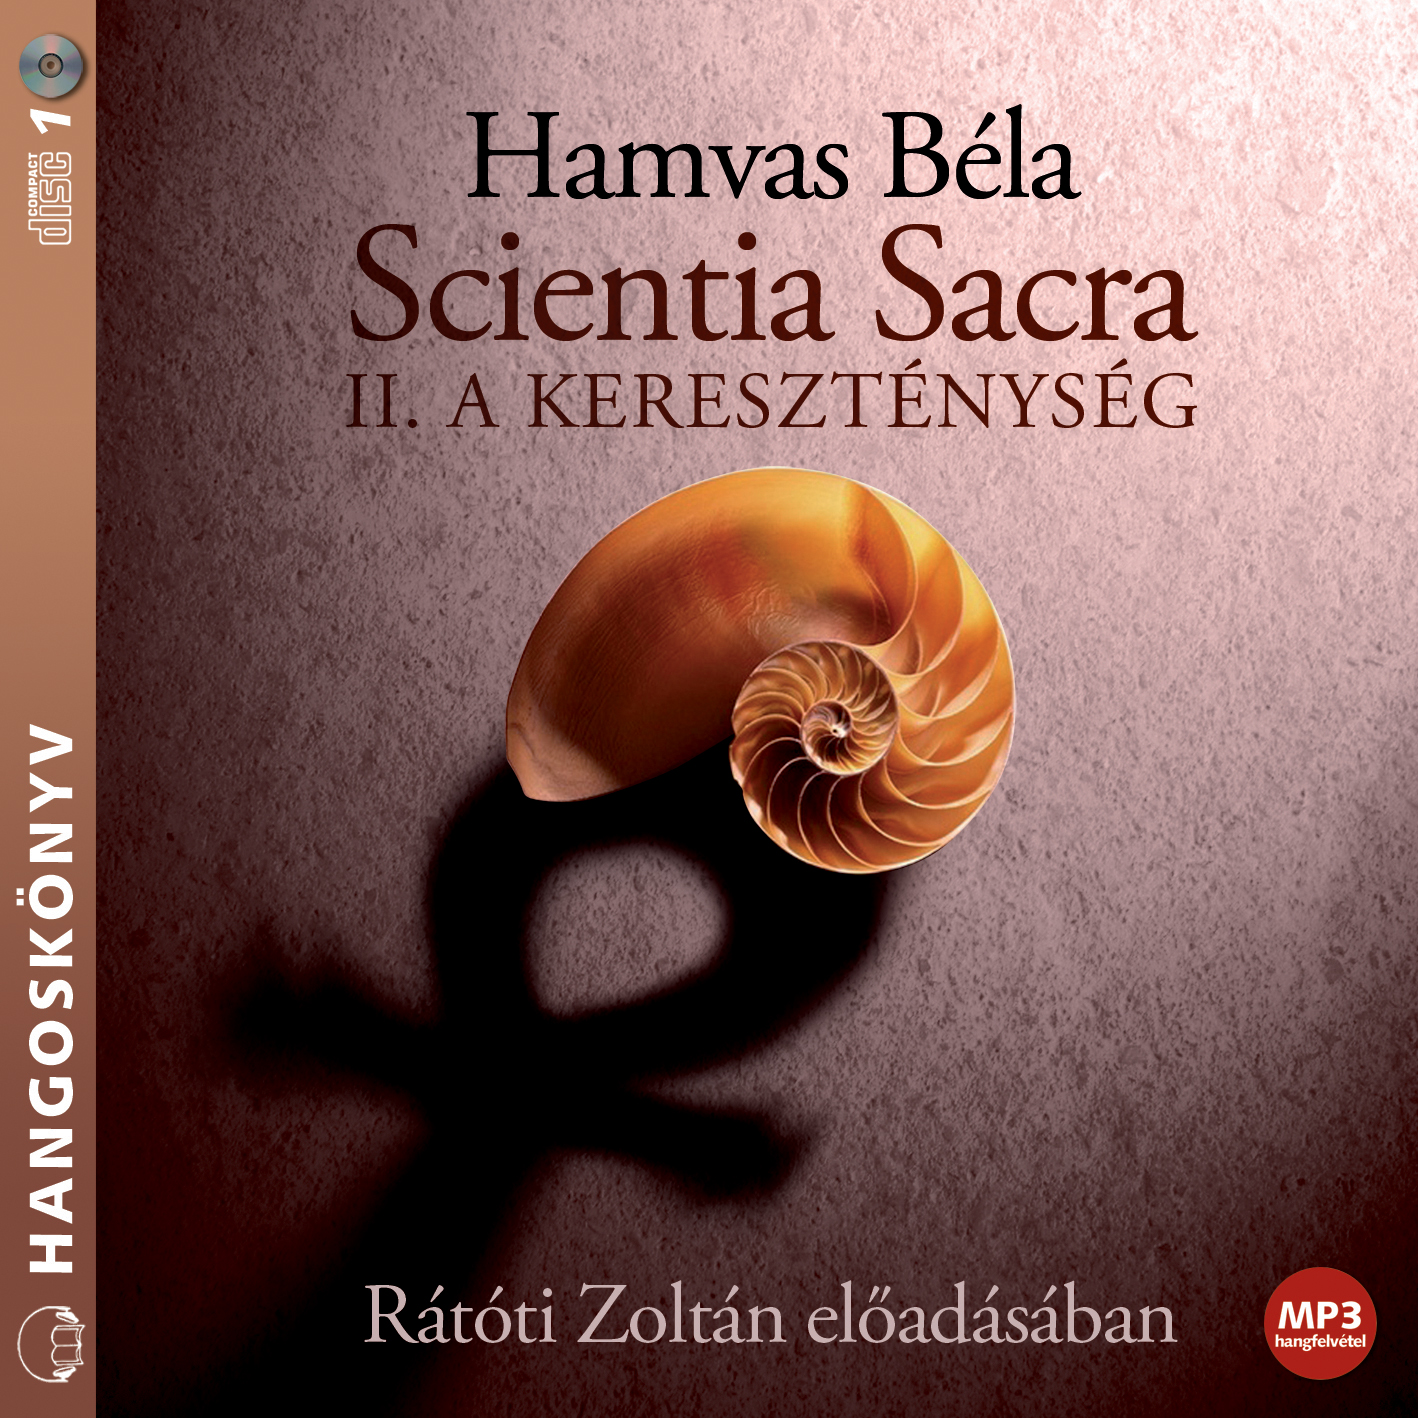 Hamvas Béla - Scientia Sacra - Hangoskönyv